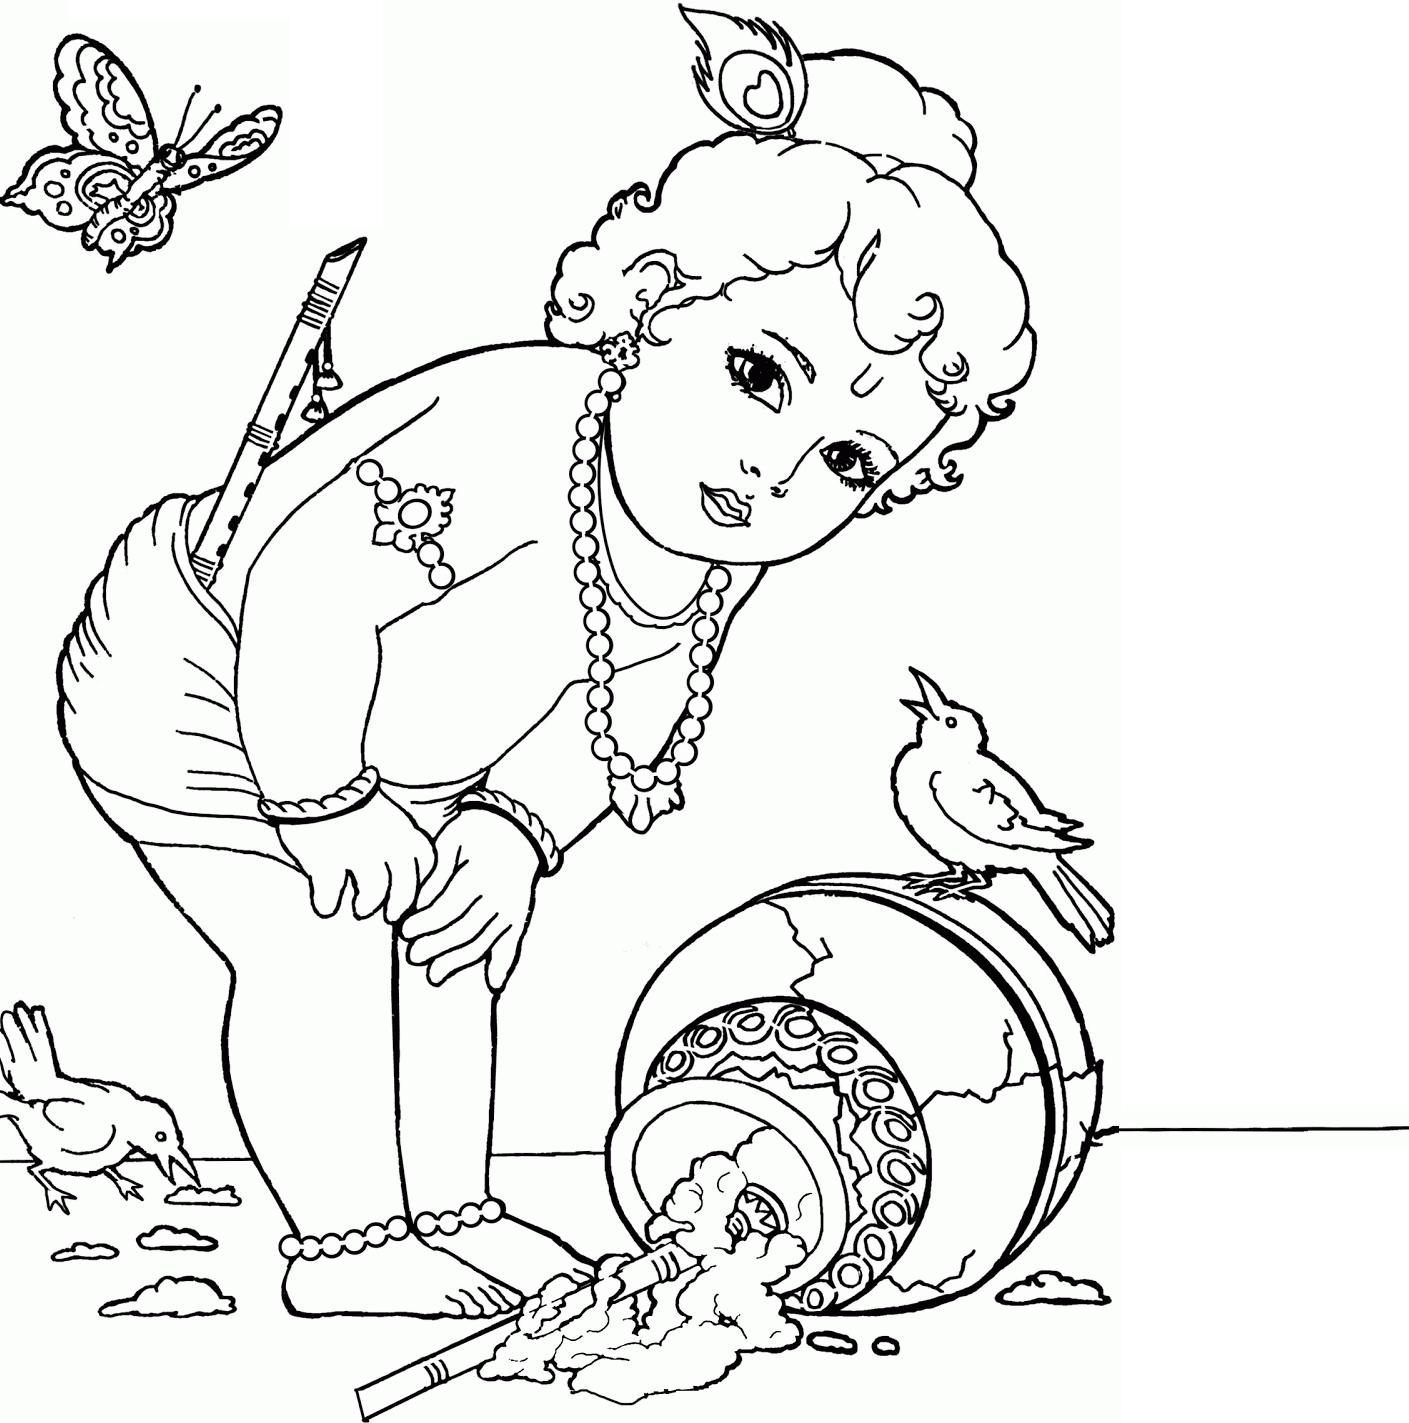 1409x1423 Pencil Sketch Of Gods Indian Gods Pencil Drawings